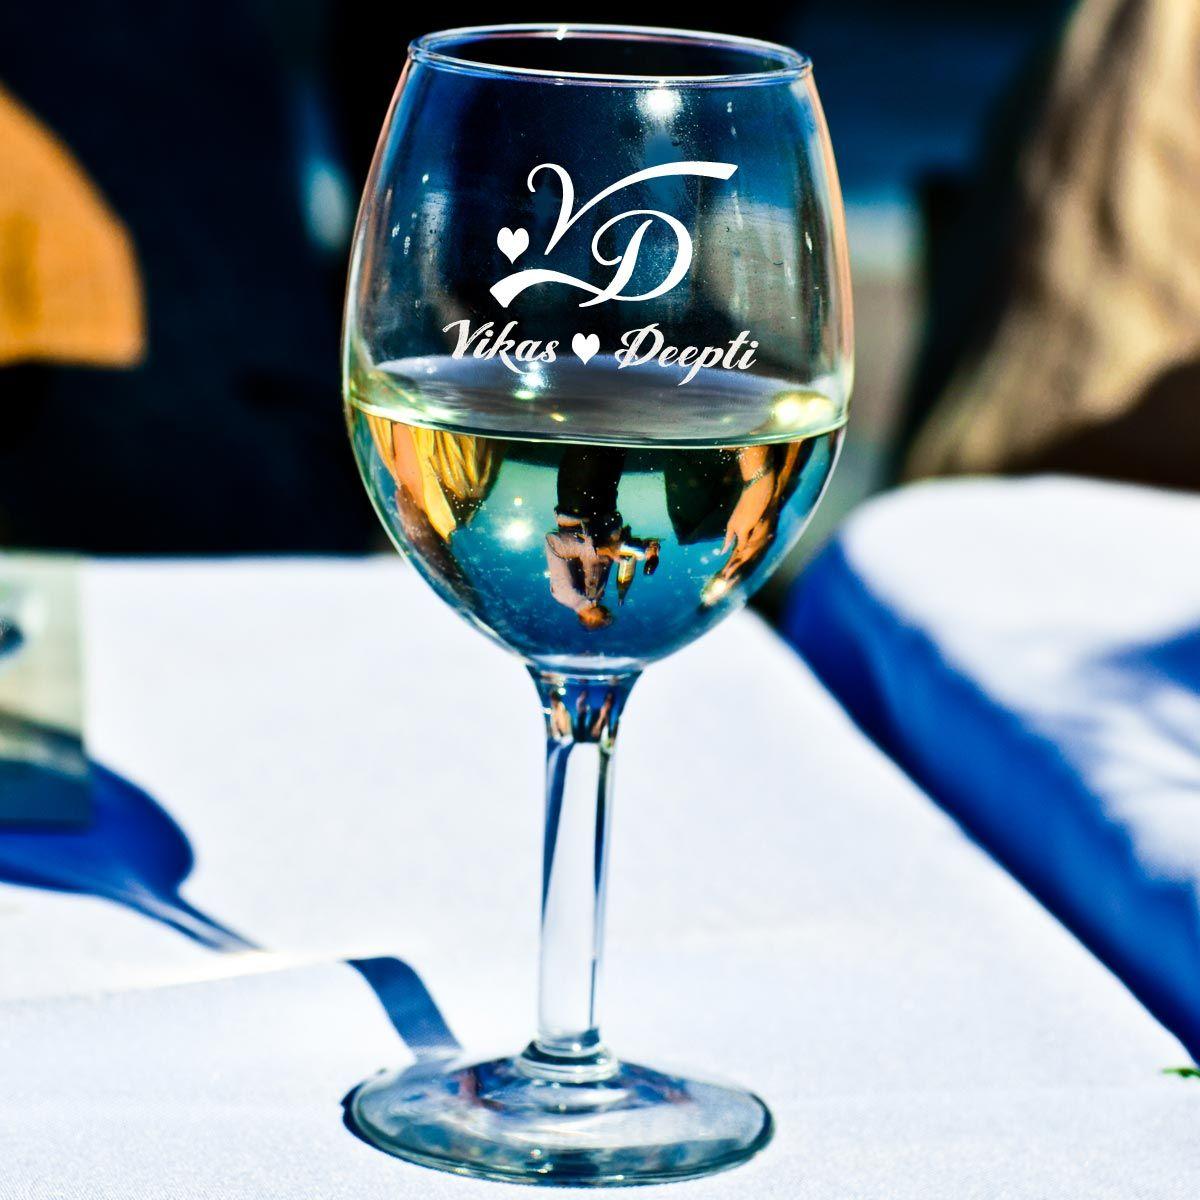 engrave wine glasses